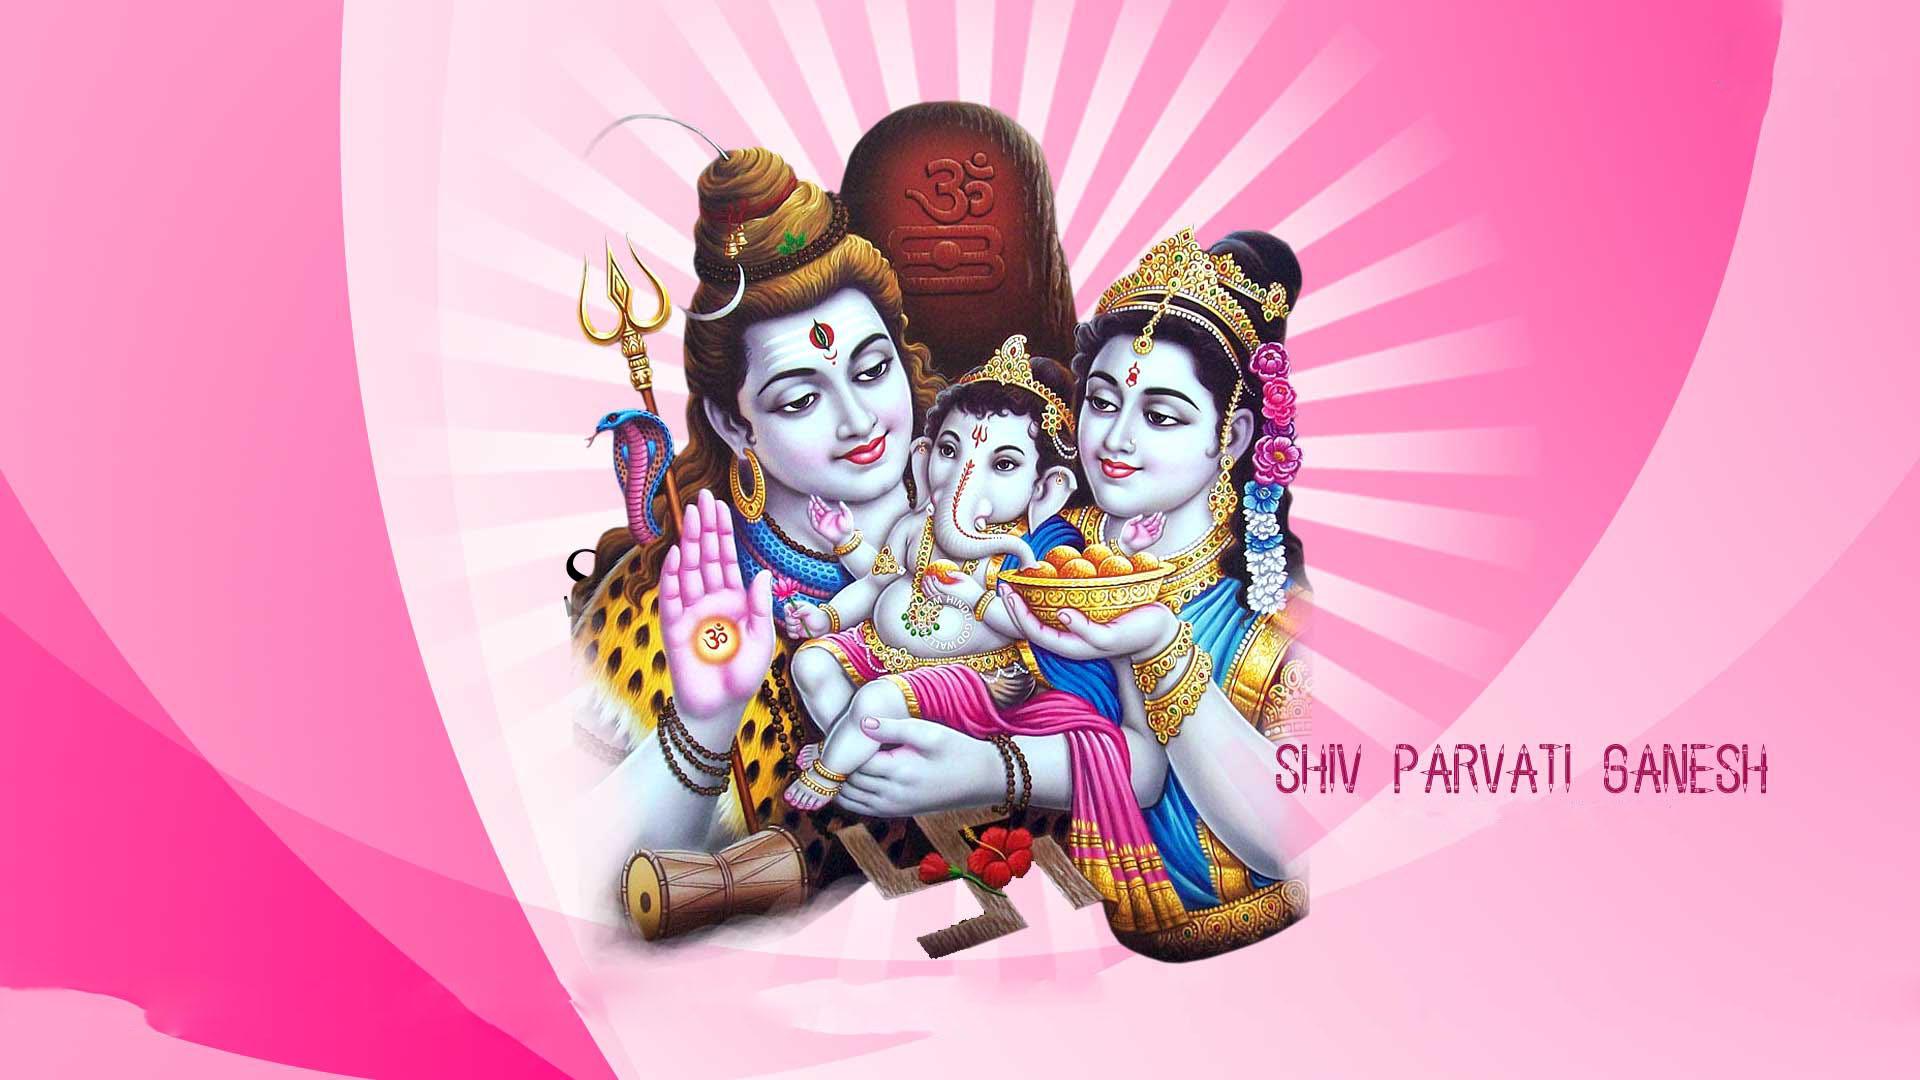 shiv parvati ganesh hd wallpaper hindu gods and goddesses